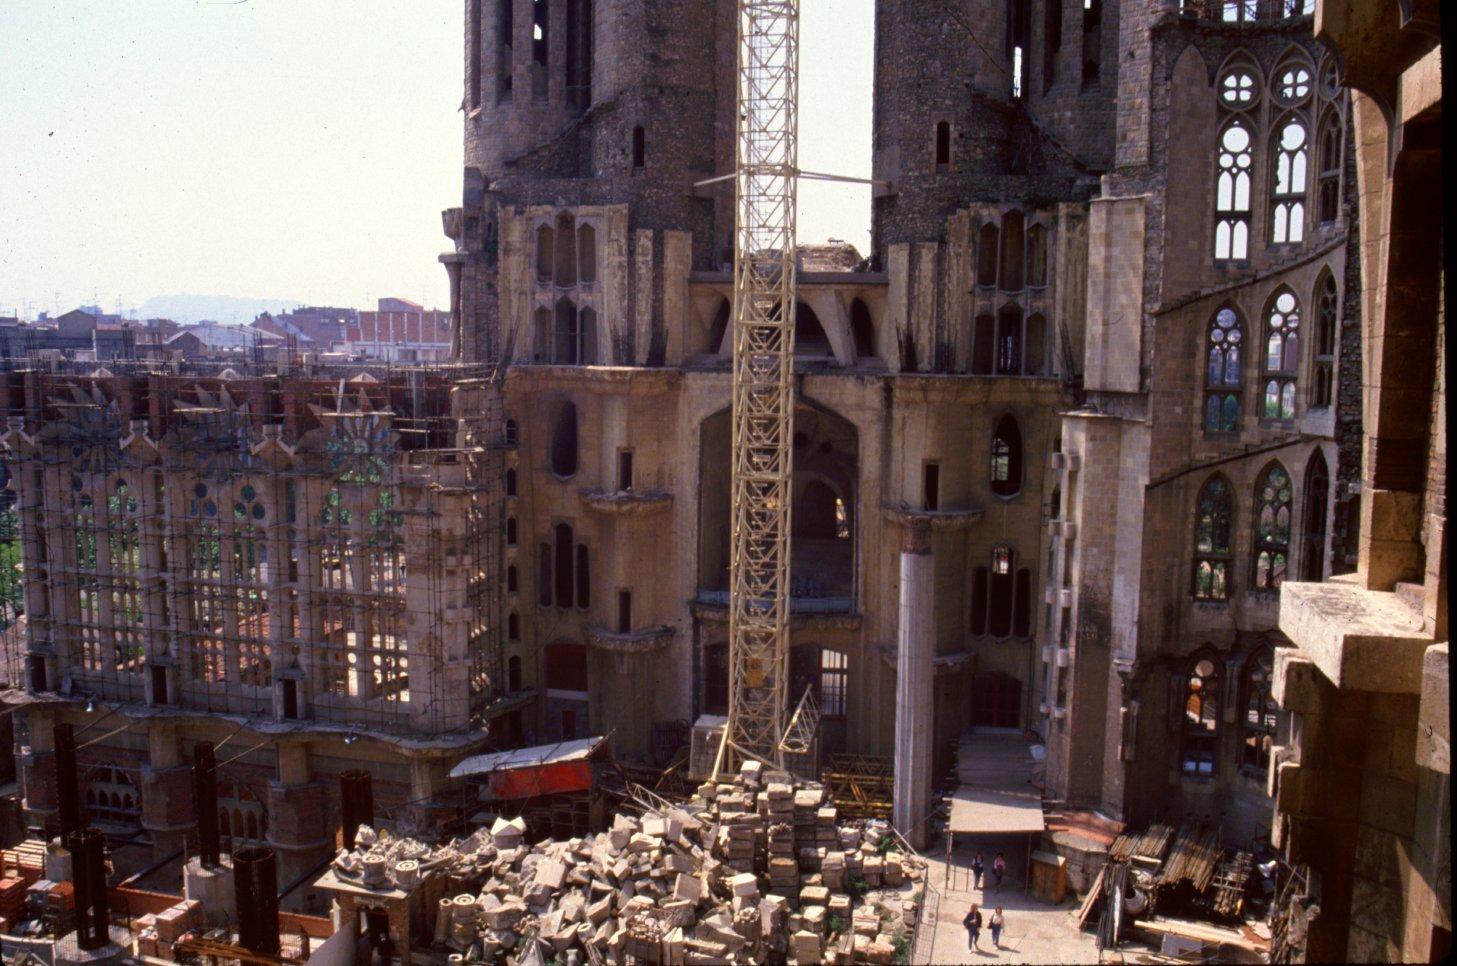 De bouw van de Sagrada Familia